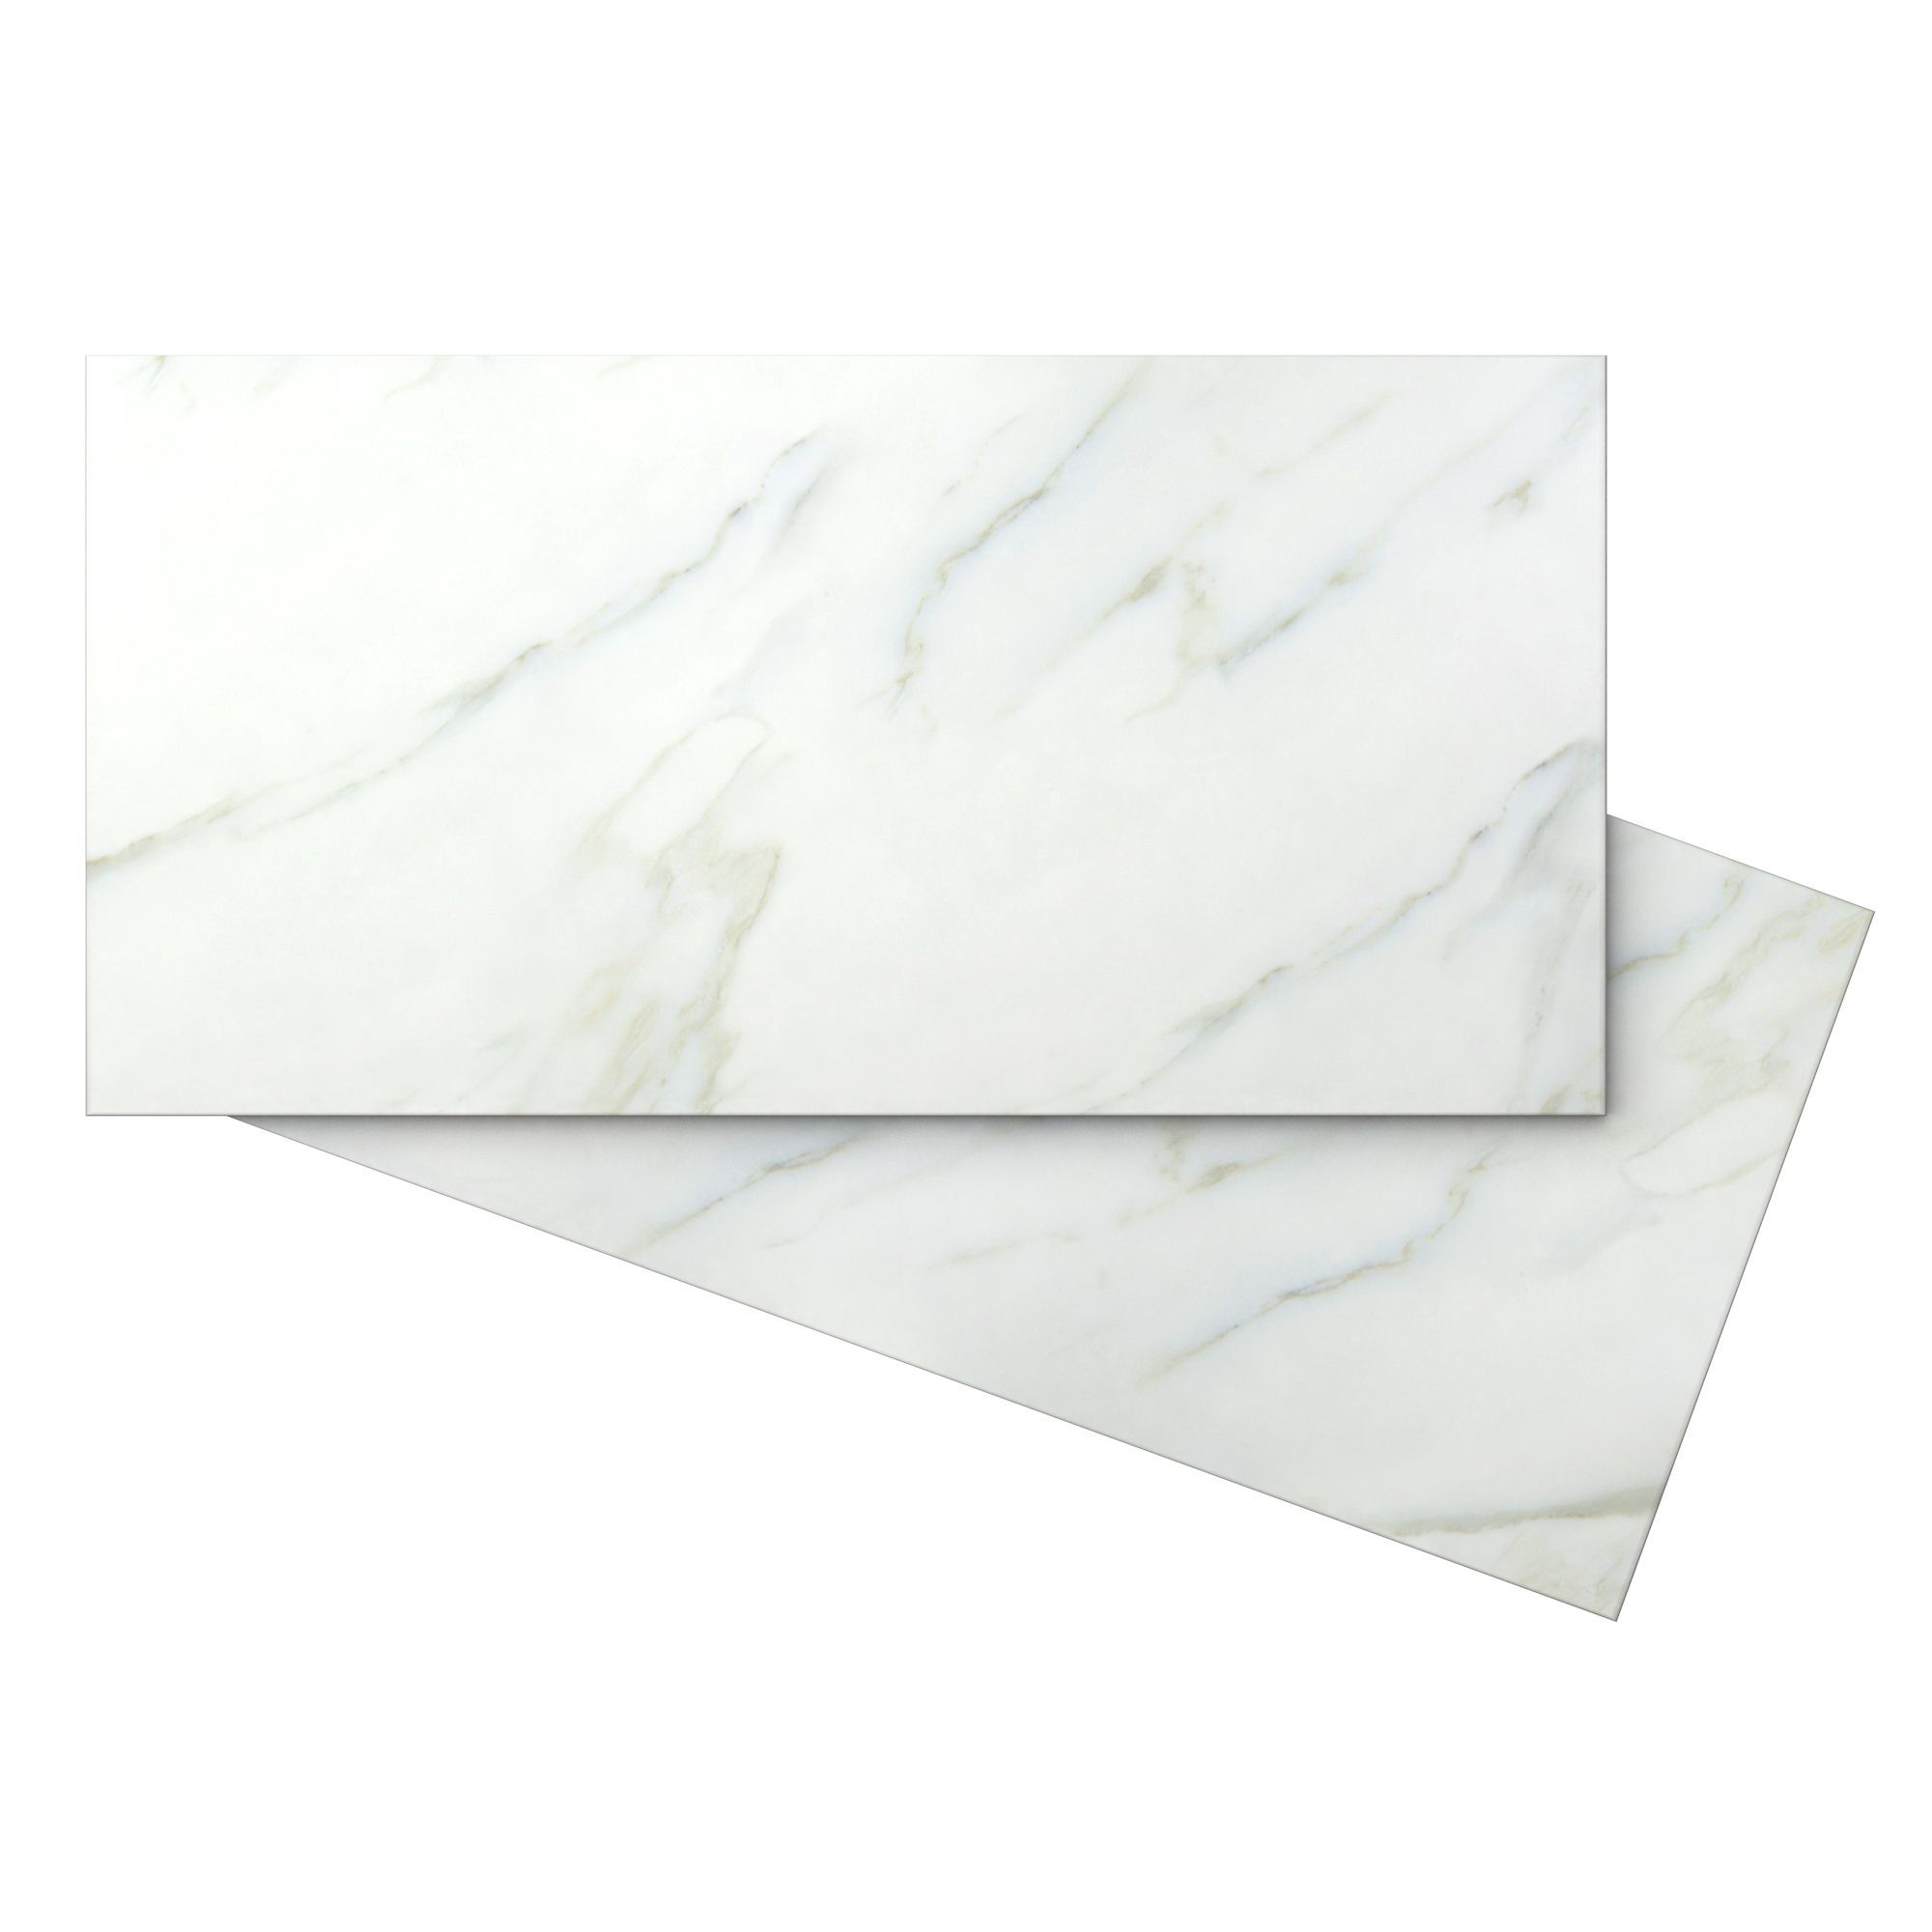 Aquila white stone effect carrara ceramic wall tile pack of 5 l aquila white stone effect carrara ceramic wall tile pack of 5 l600mm w300mm departments diy at bq doublecrazyfo Choice Image